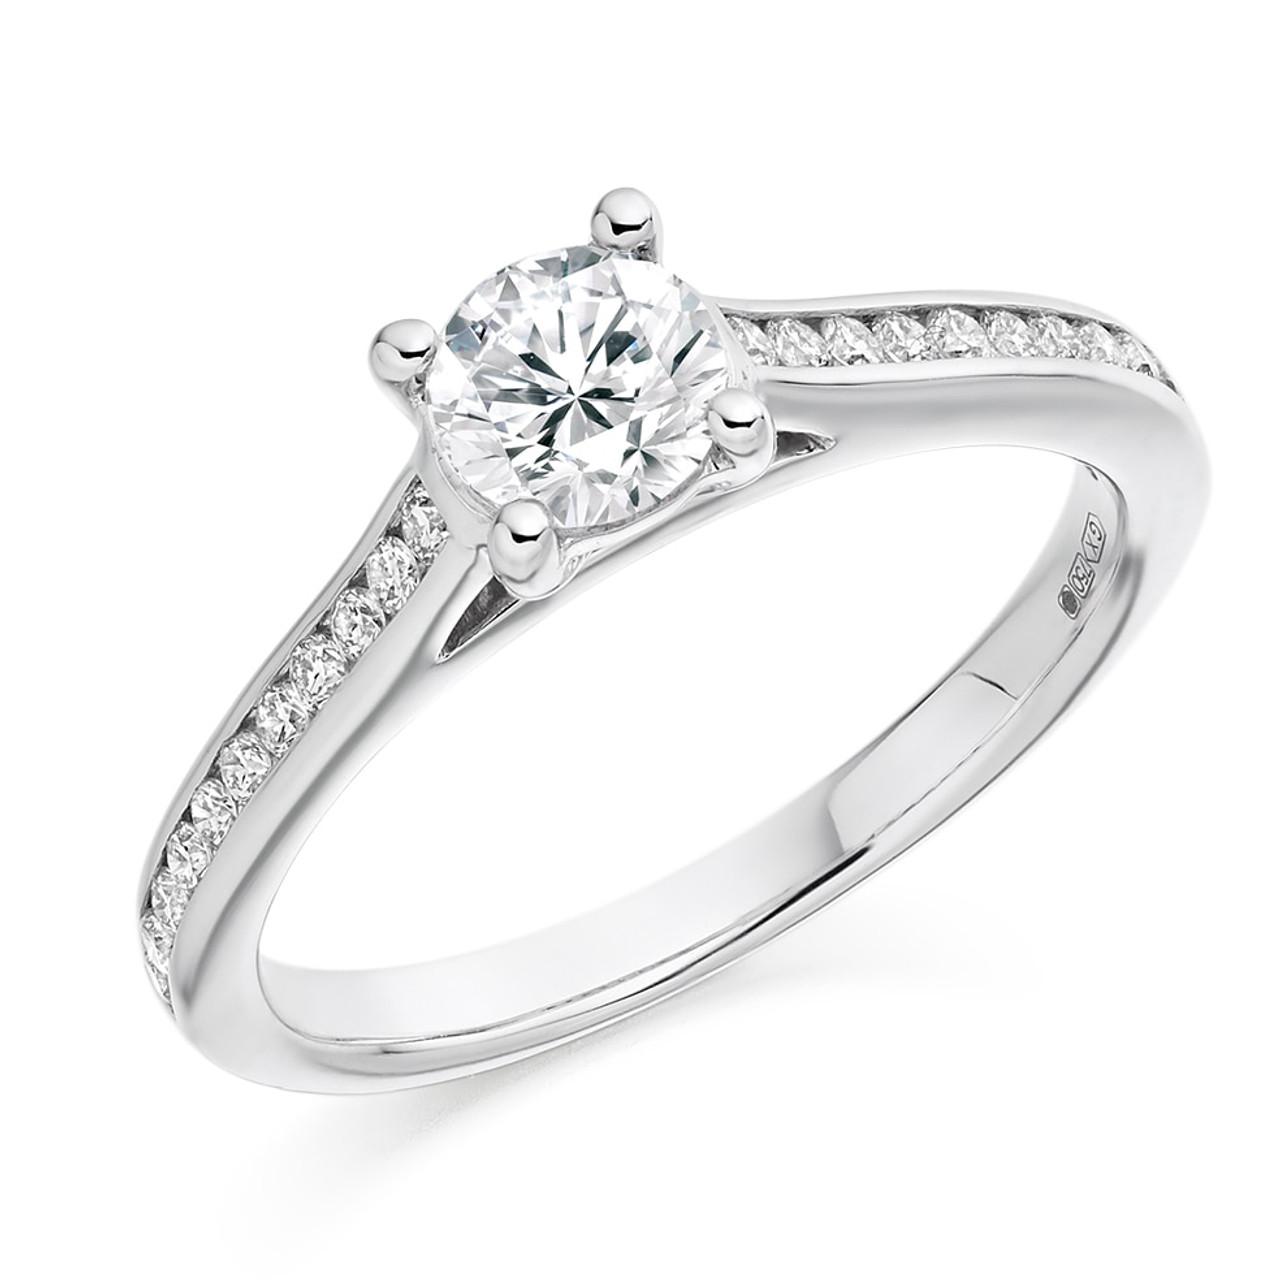 Hawthorn 0.25ct Diamond Engagement Ring